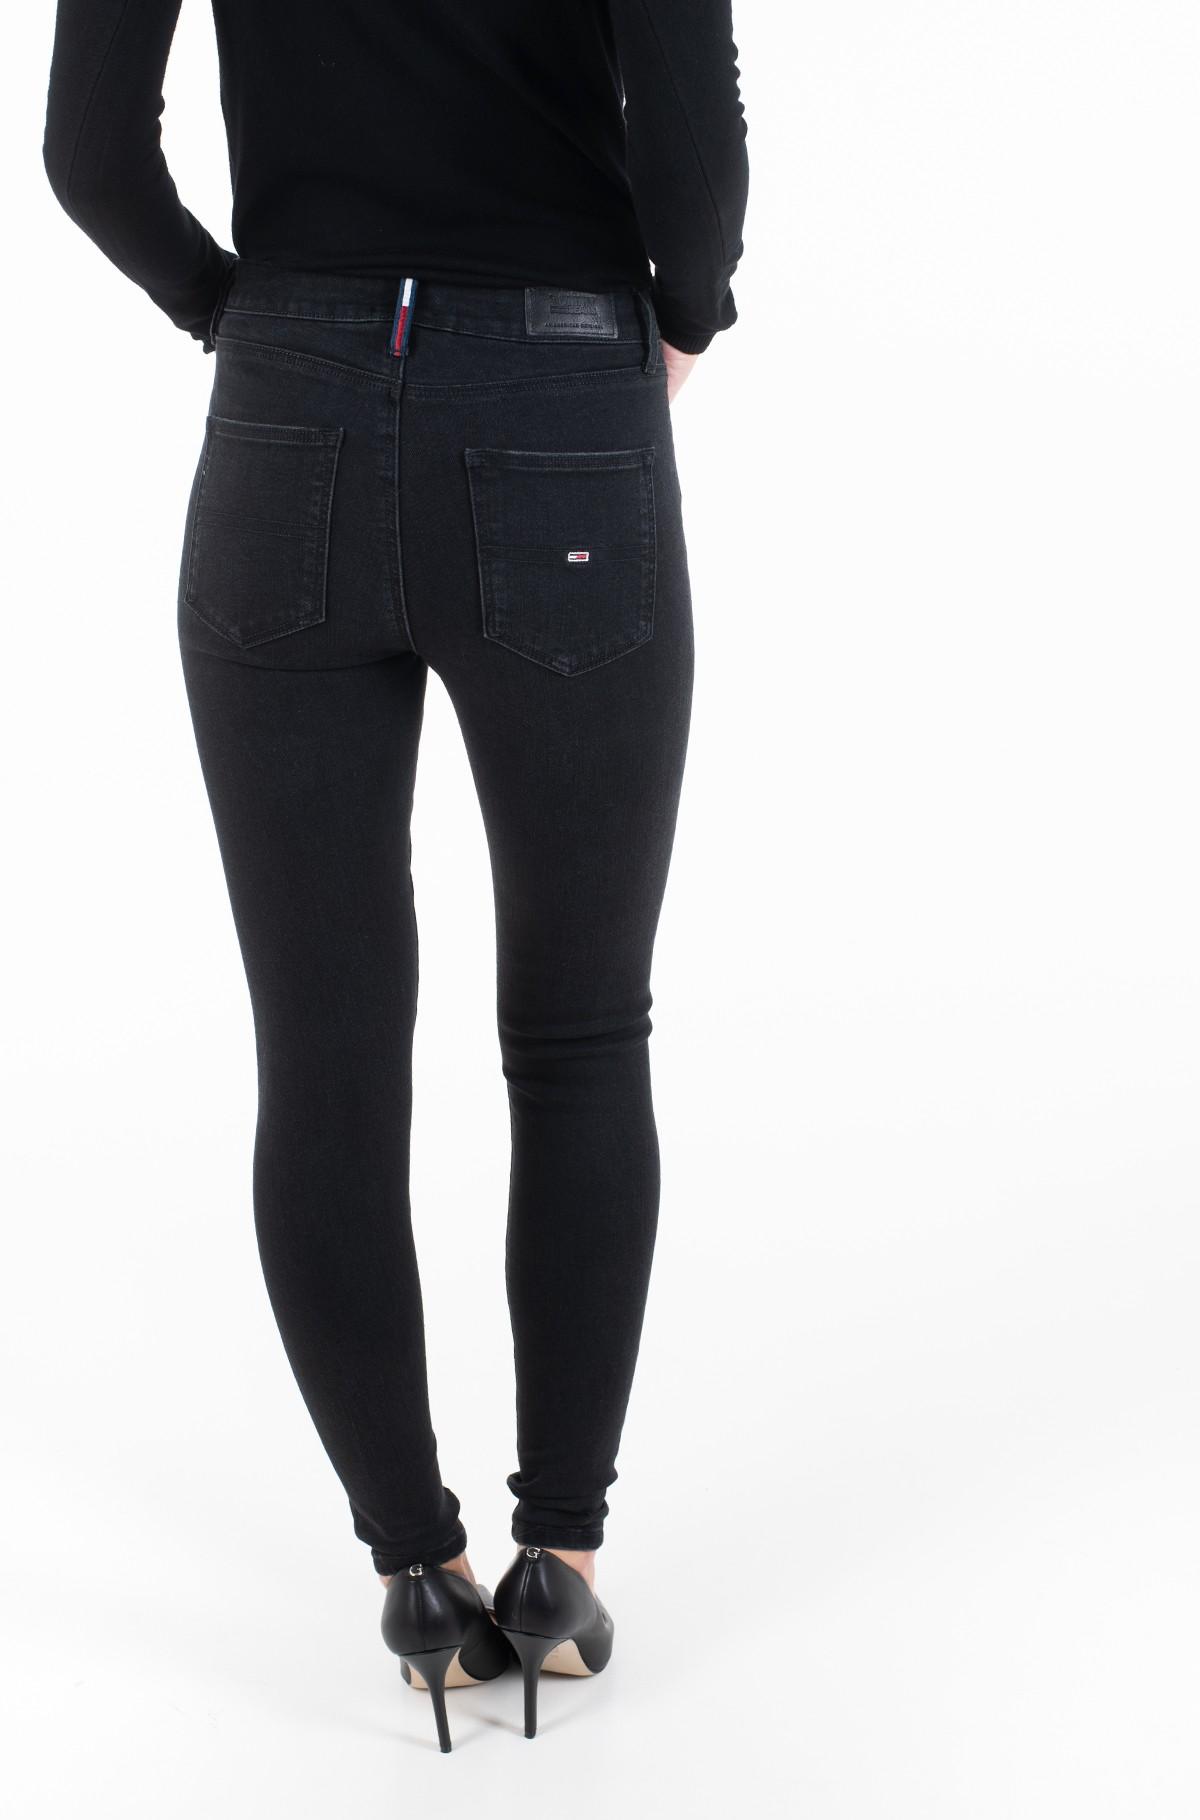 Jeans TJ 2008 HIGH RISE SPR SKNY DYSBK-full-3